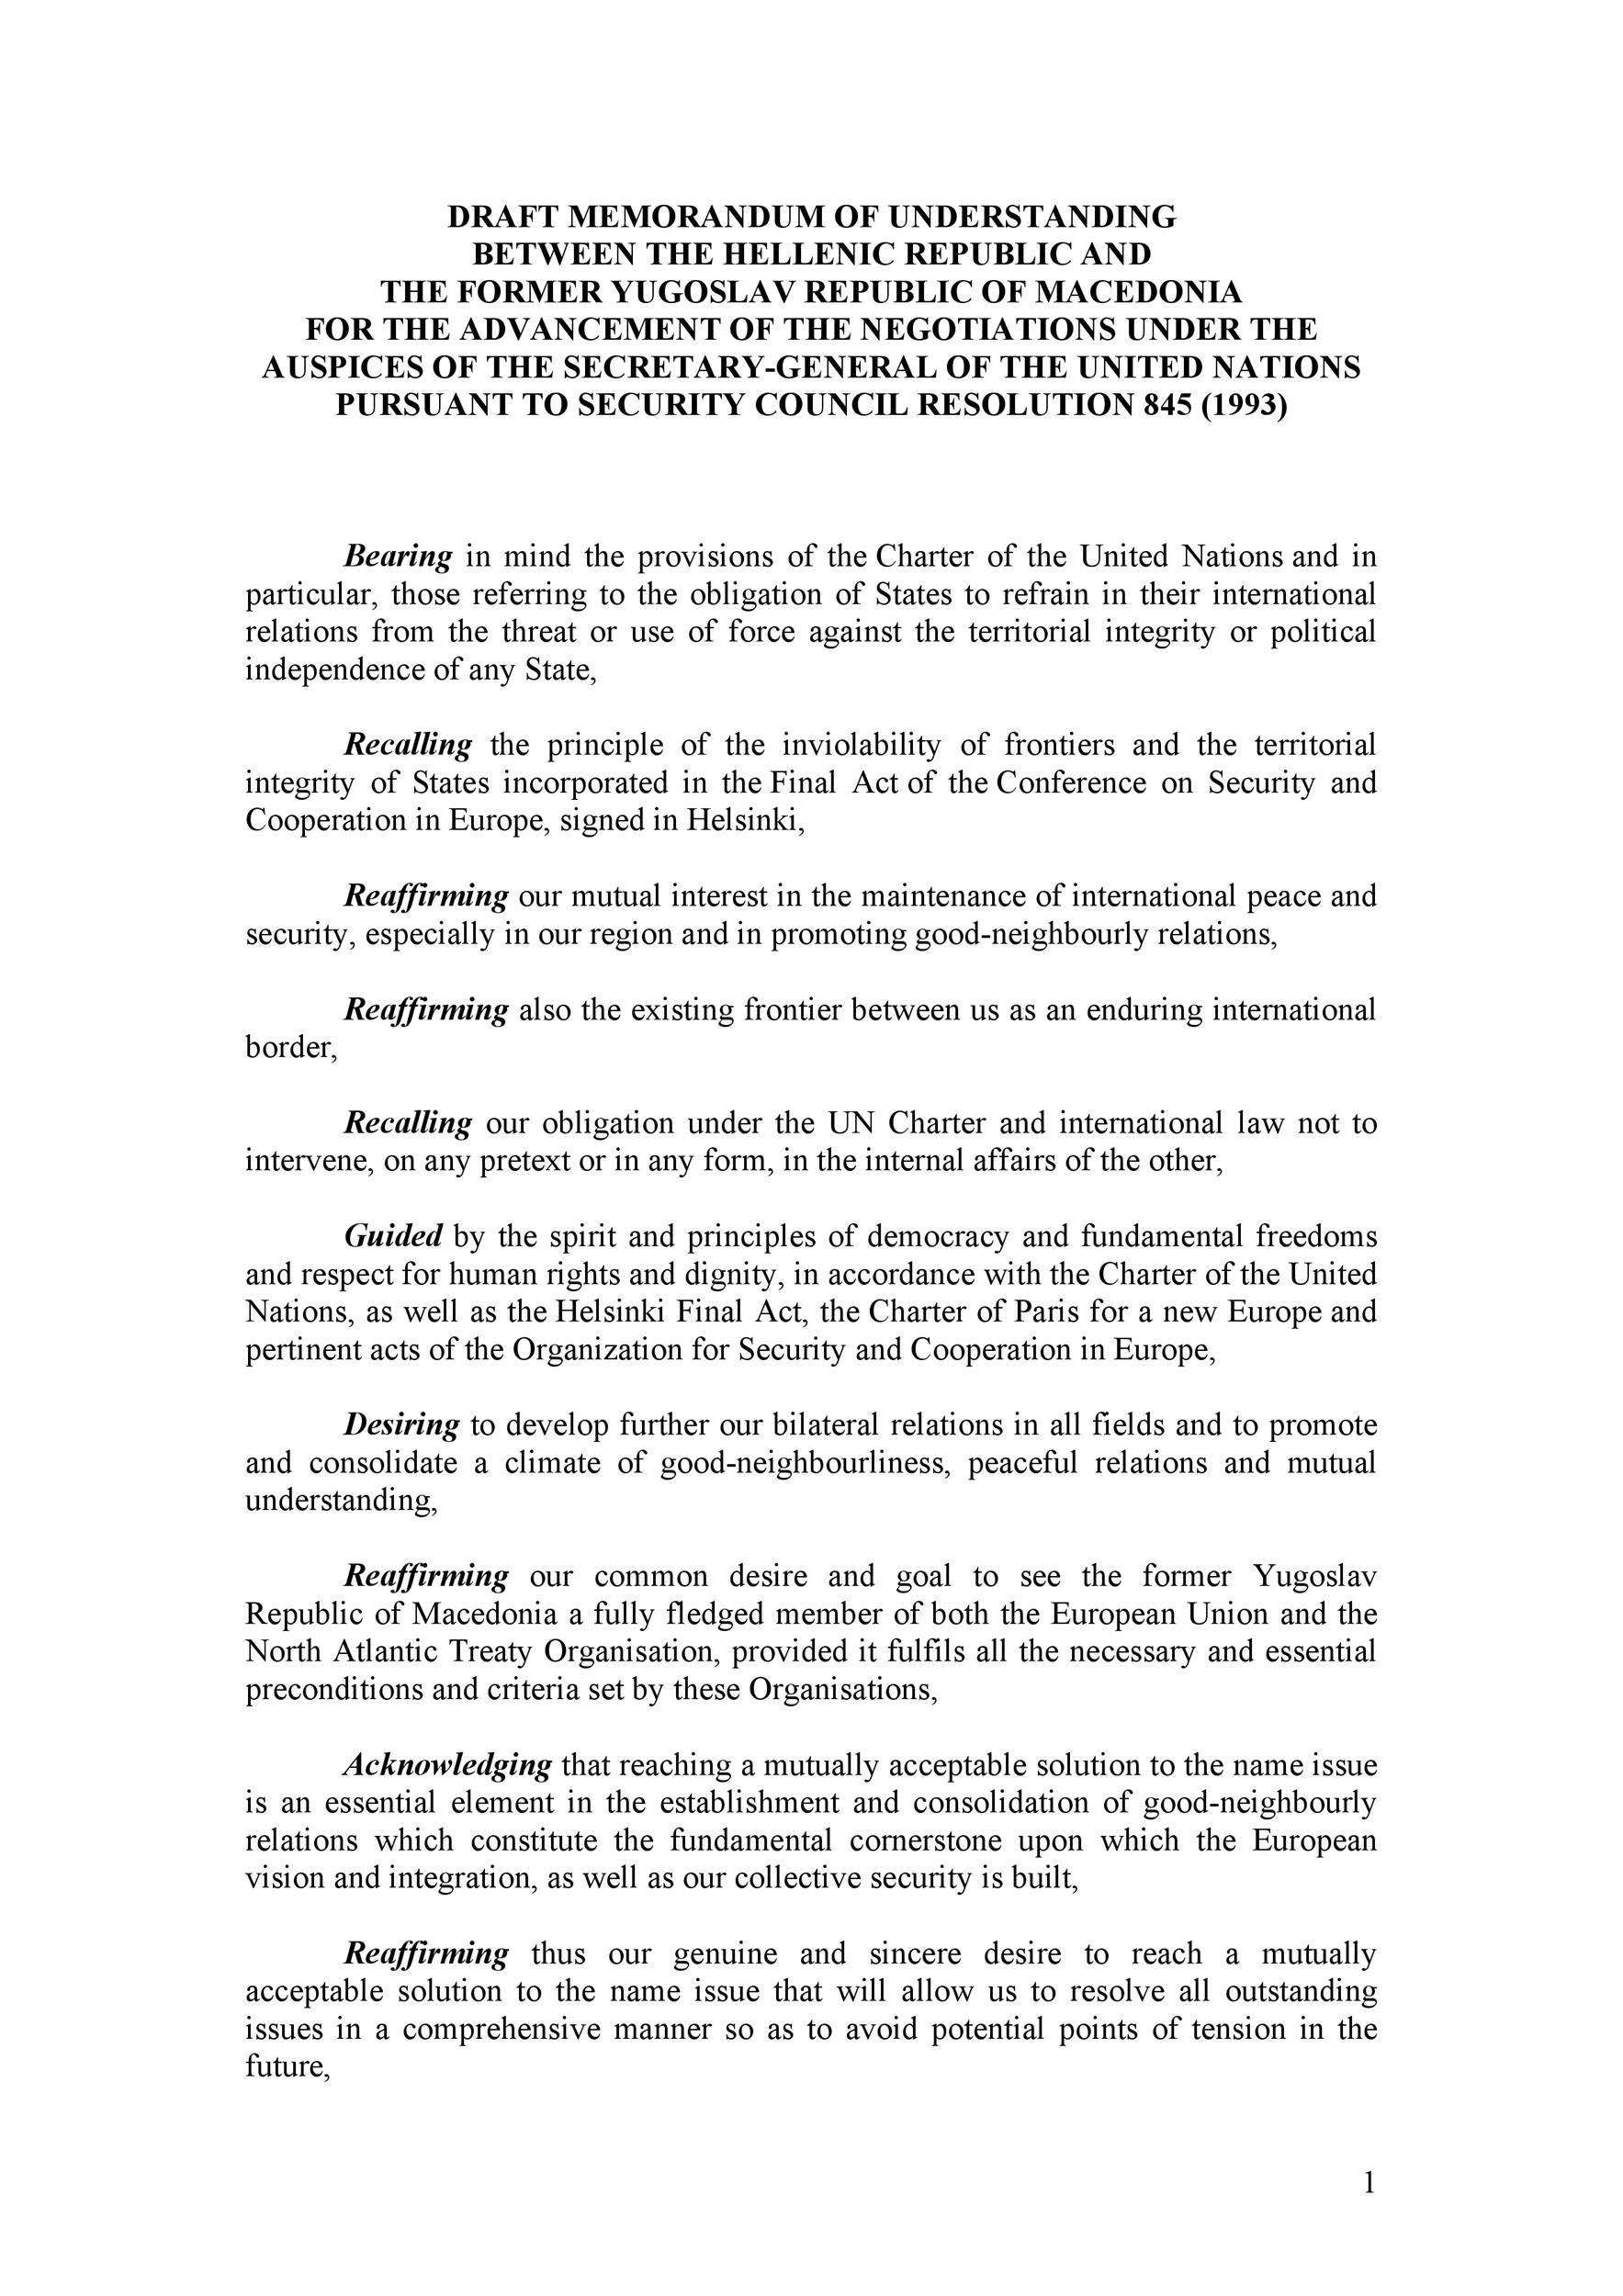 Free Memorandum of Understanding Template 49